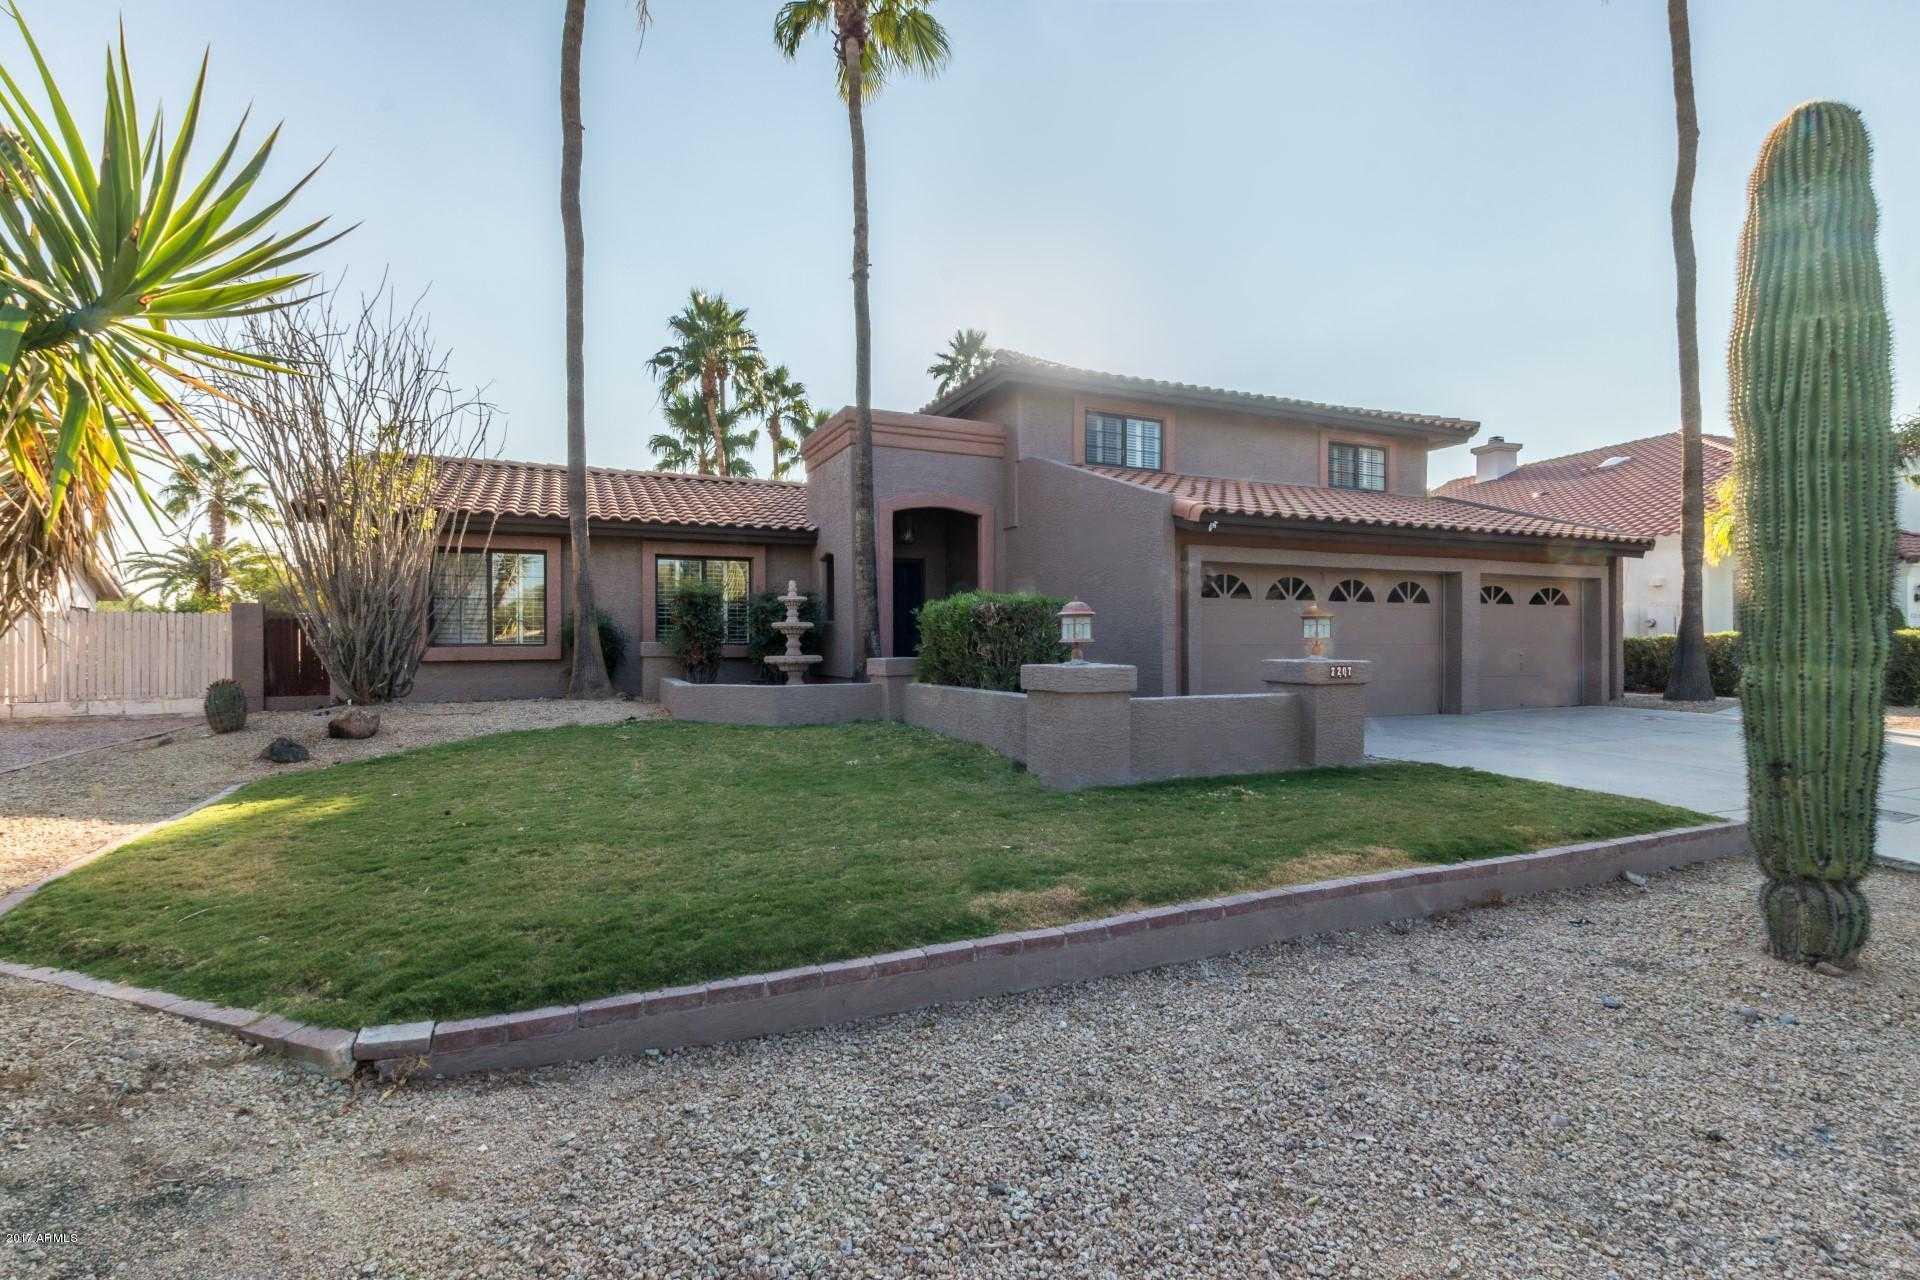 $397,000 - 4Br/3Ba - Home for Sale in Arrowhead Oasis Amd Lt 1-88 Tr, Glendale